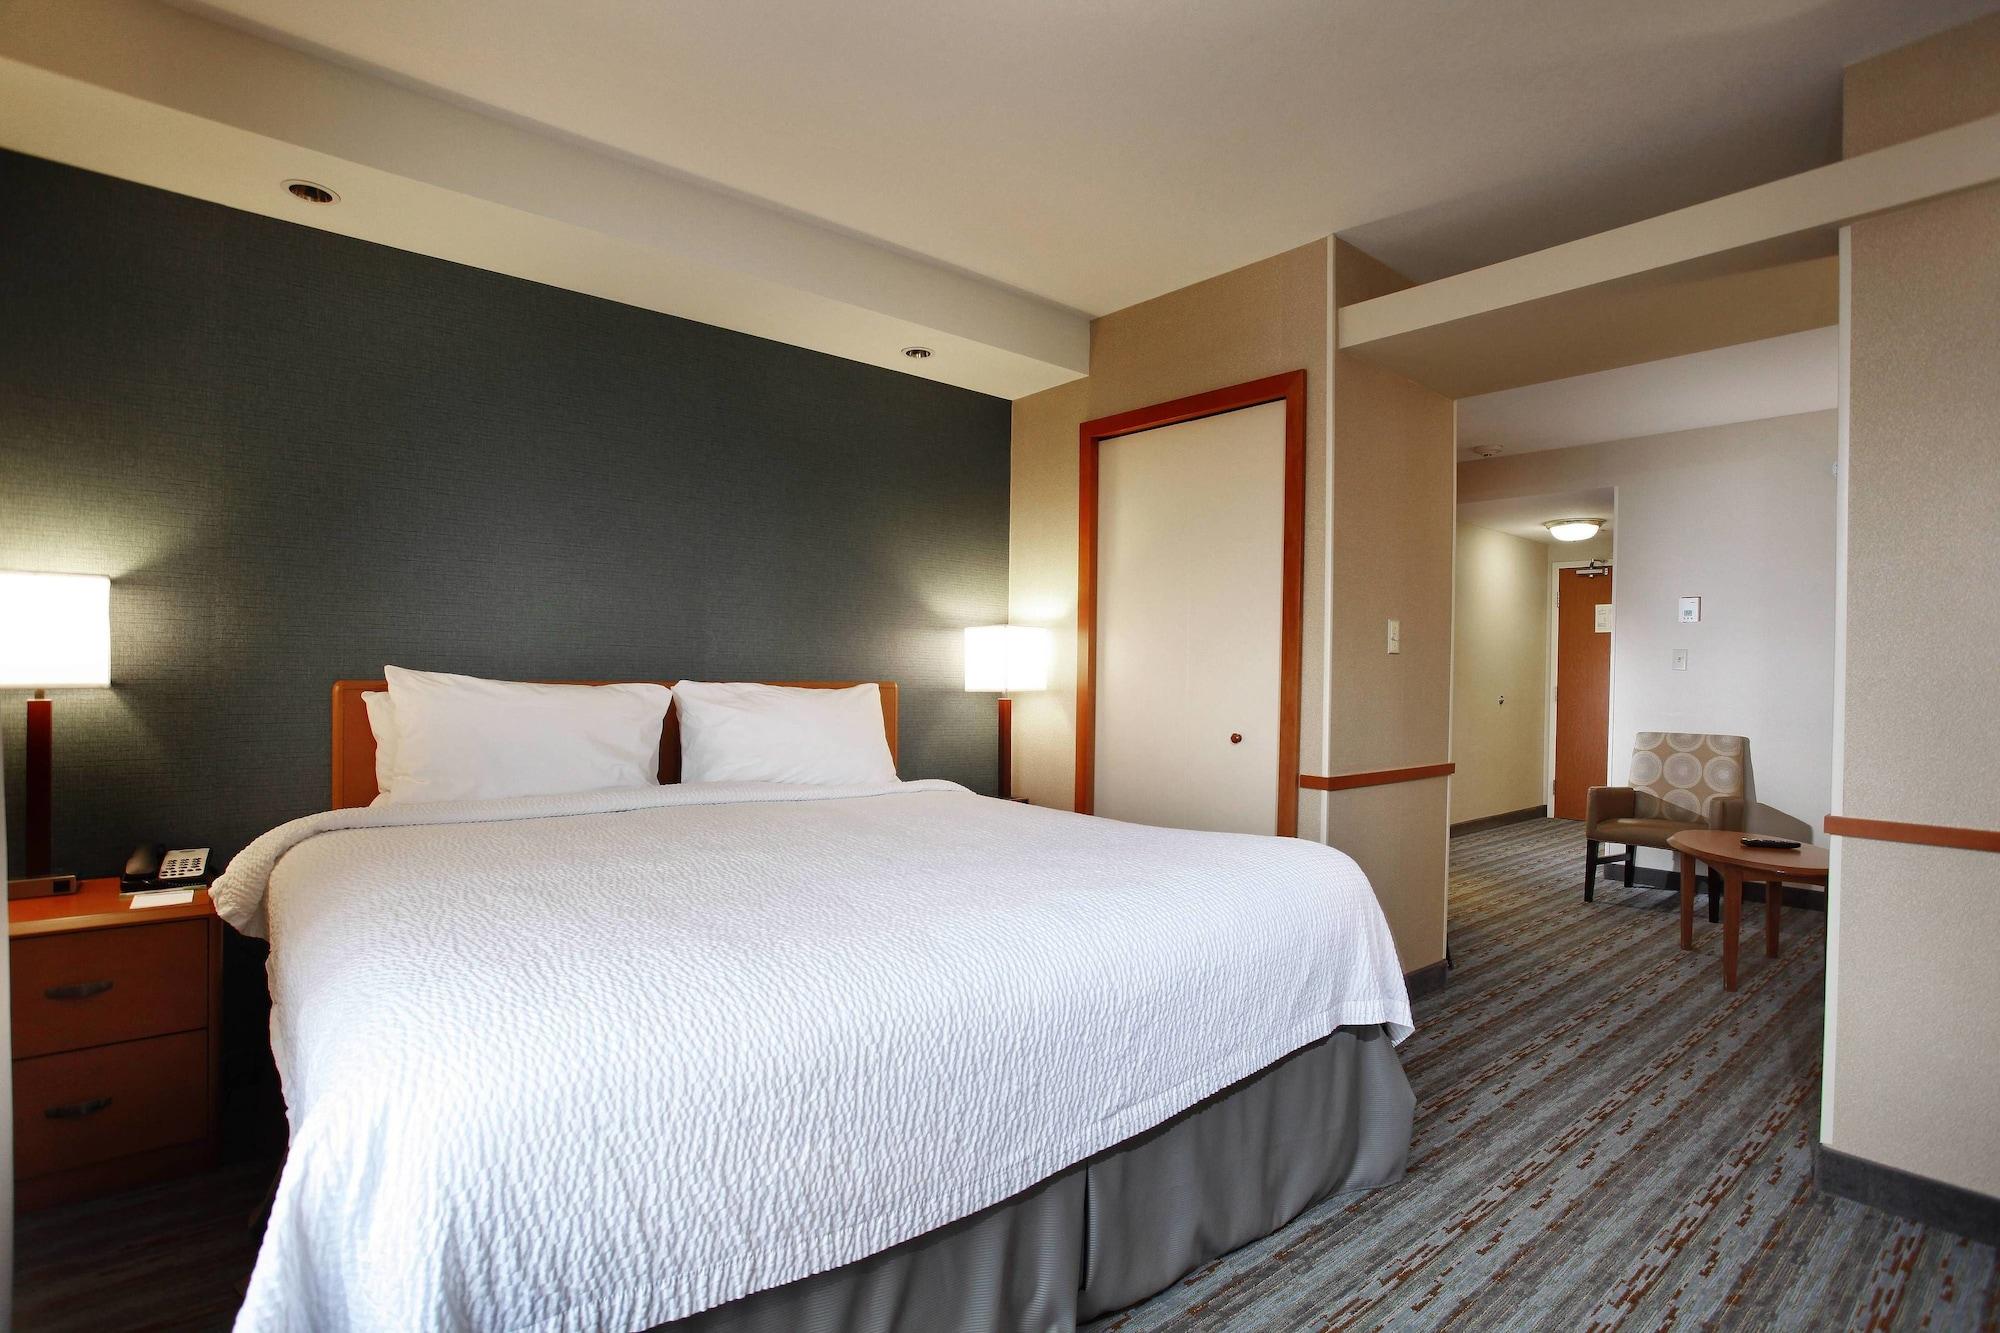 Fairfield Inn & Suites by Marriott Sudbury, Greater Sudbury